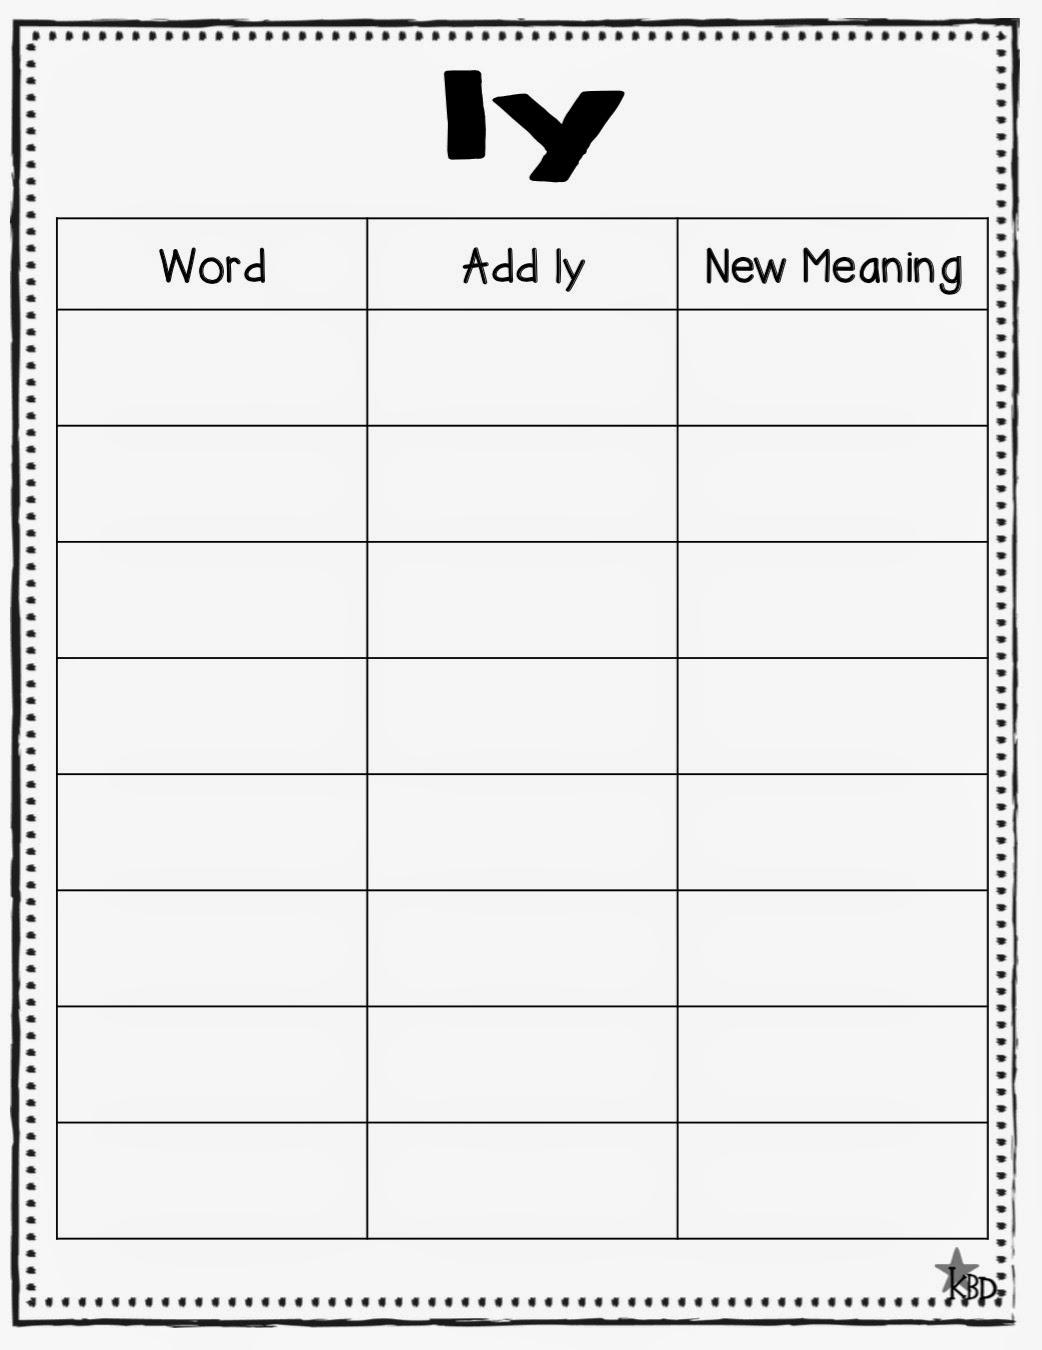 17 Best Images Of Words To Add Endings Worksheet